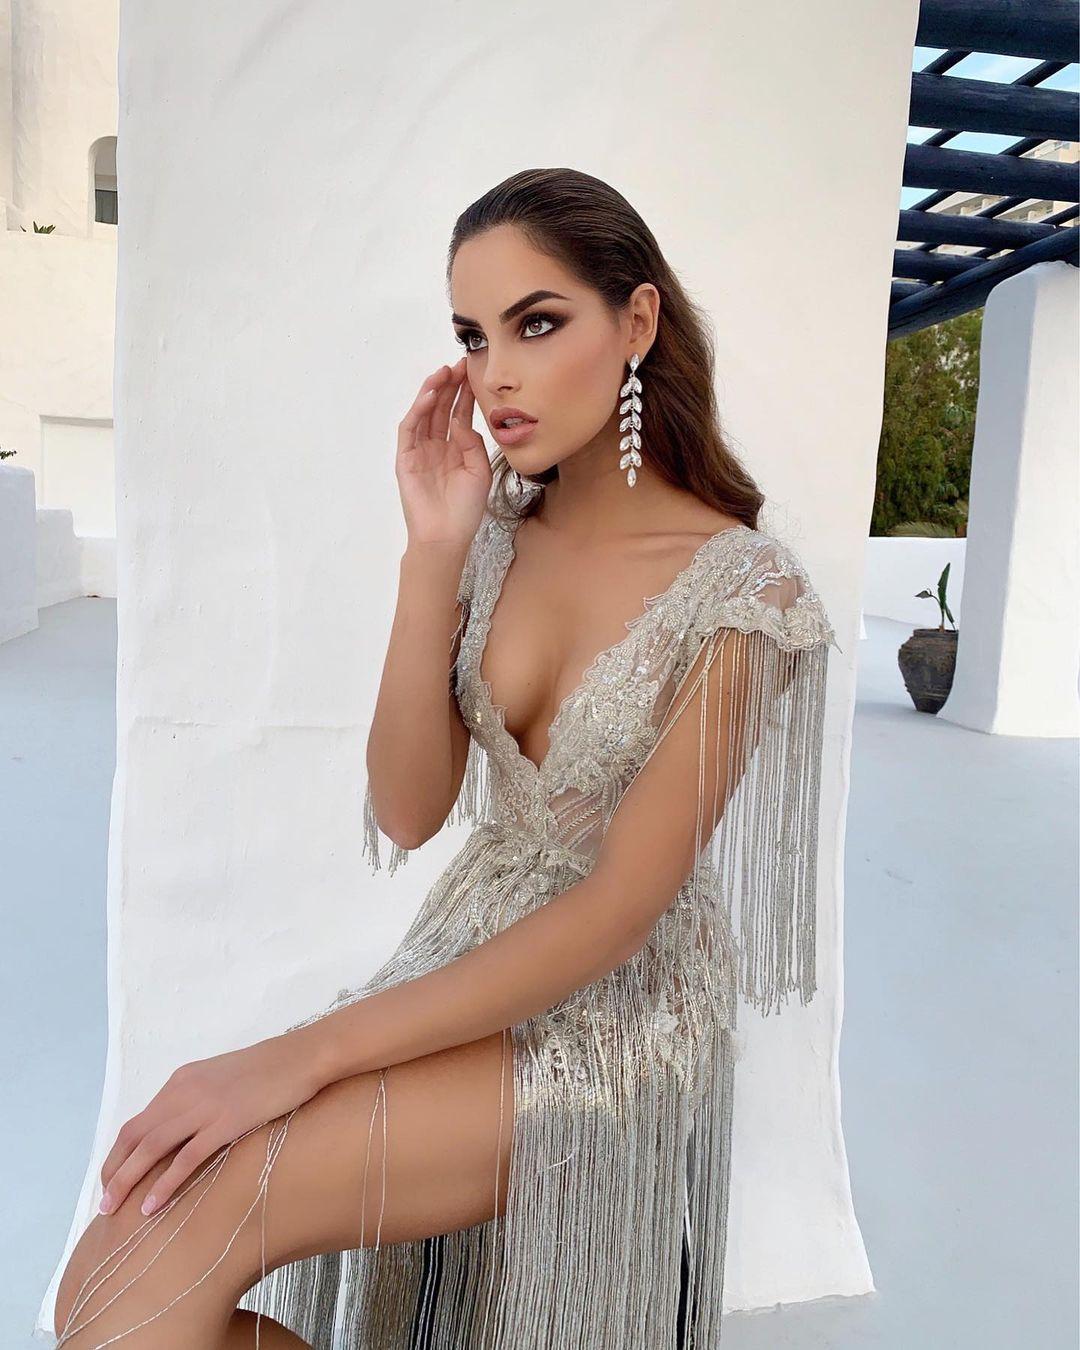 andrea de las heras, miss grand spain 2020/miss europe 2019. - Página 3 12546710